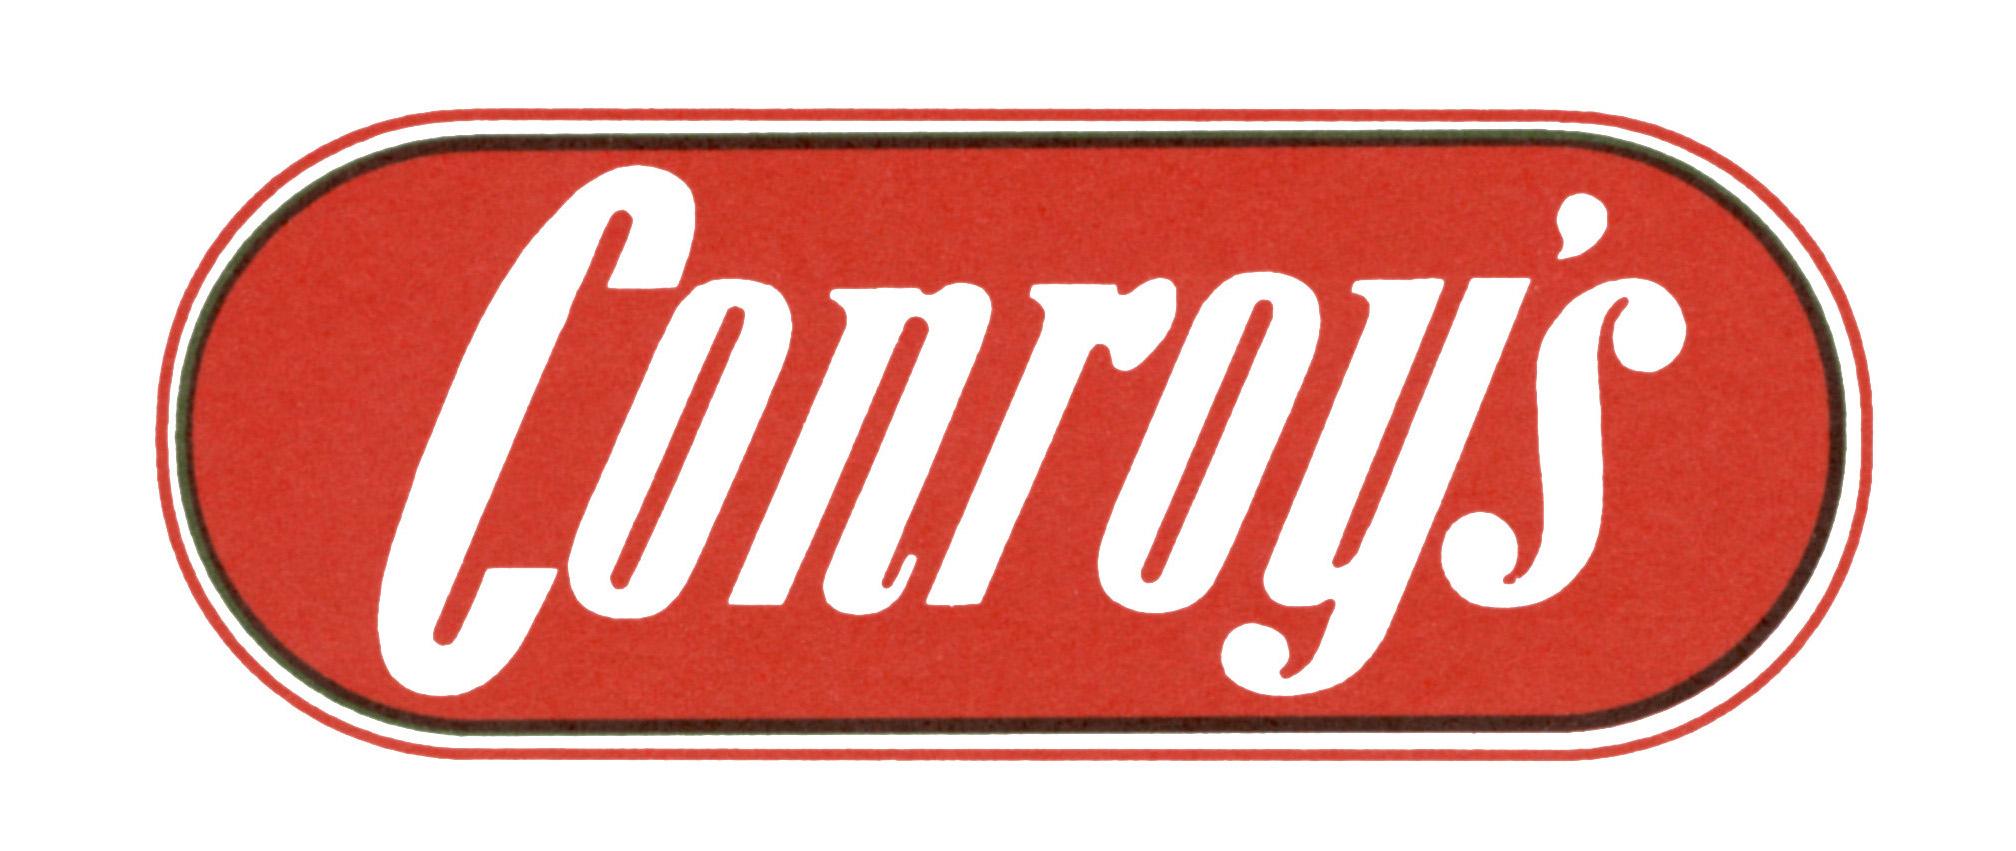 Conroy's Smallgoods